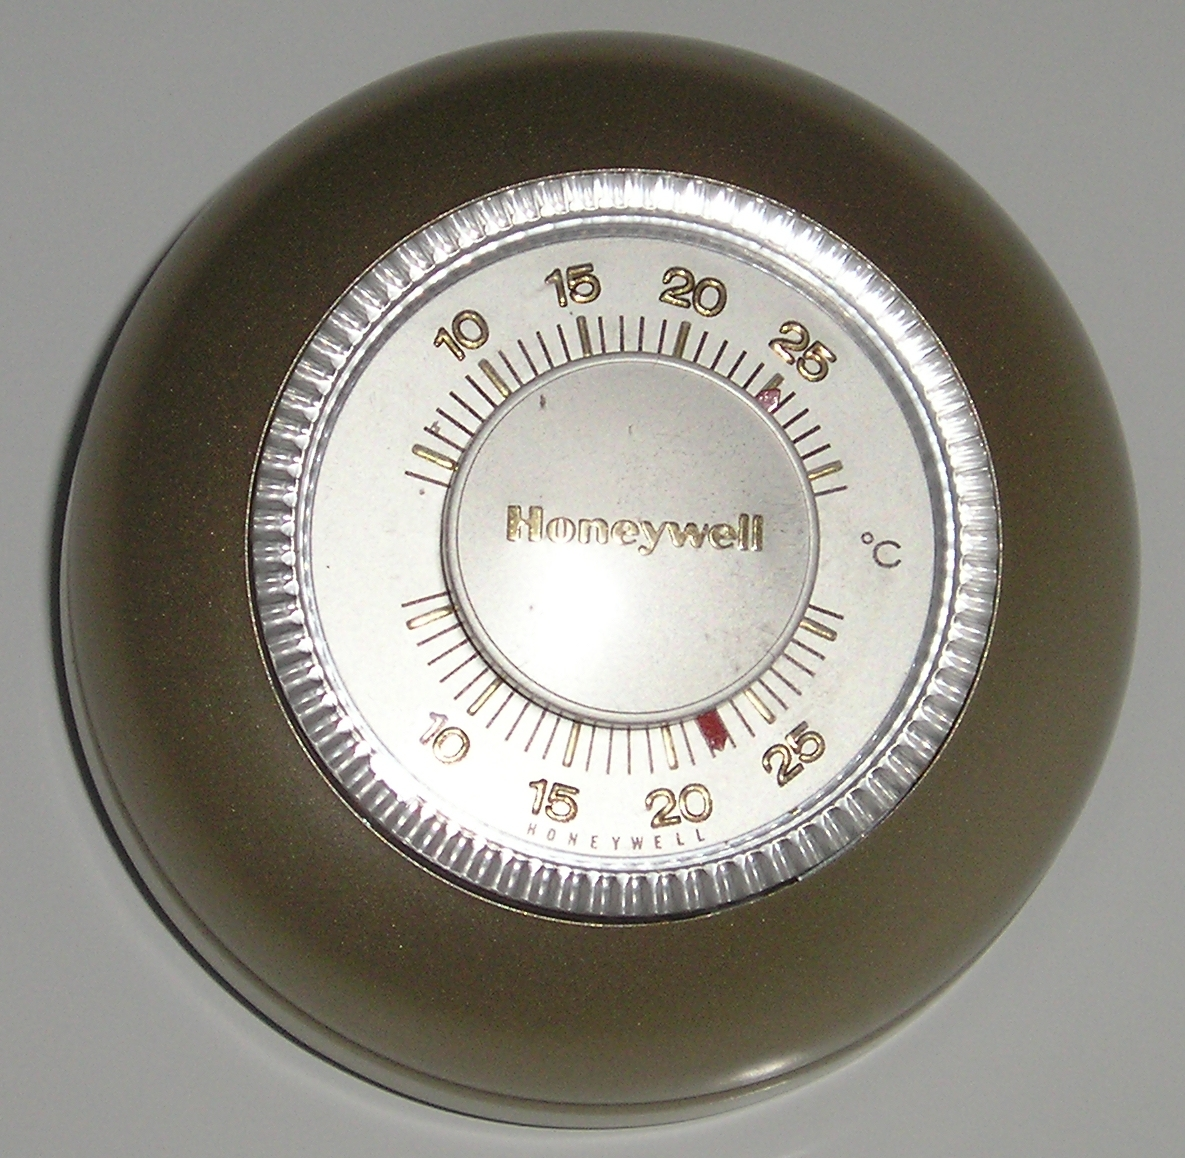 old honeywell thermostat wiring diagram 1975 fj40 dual fuel free engine